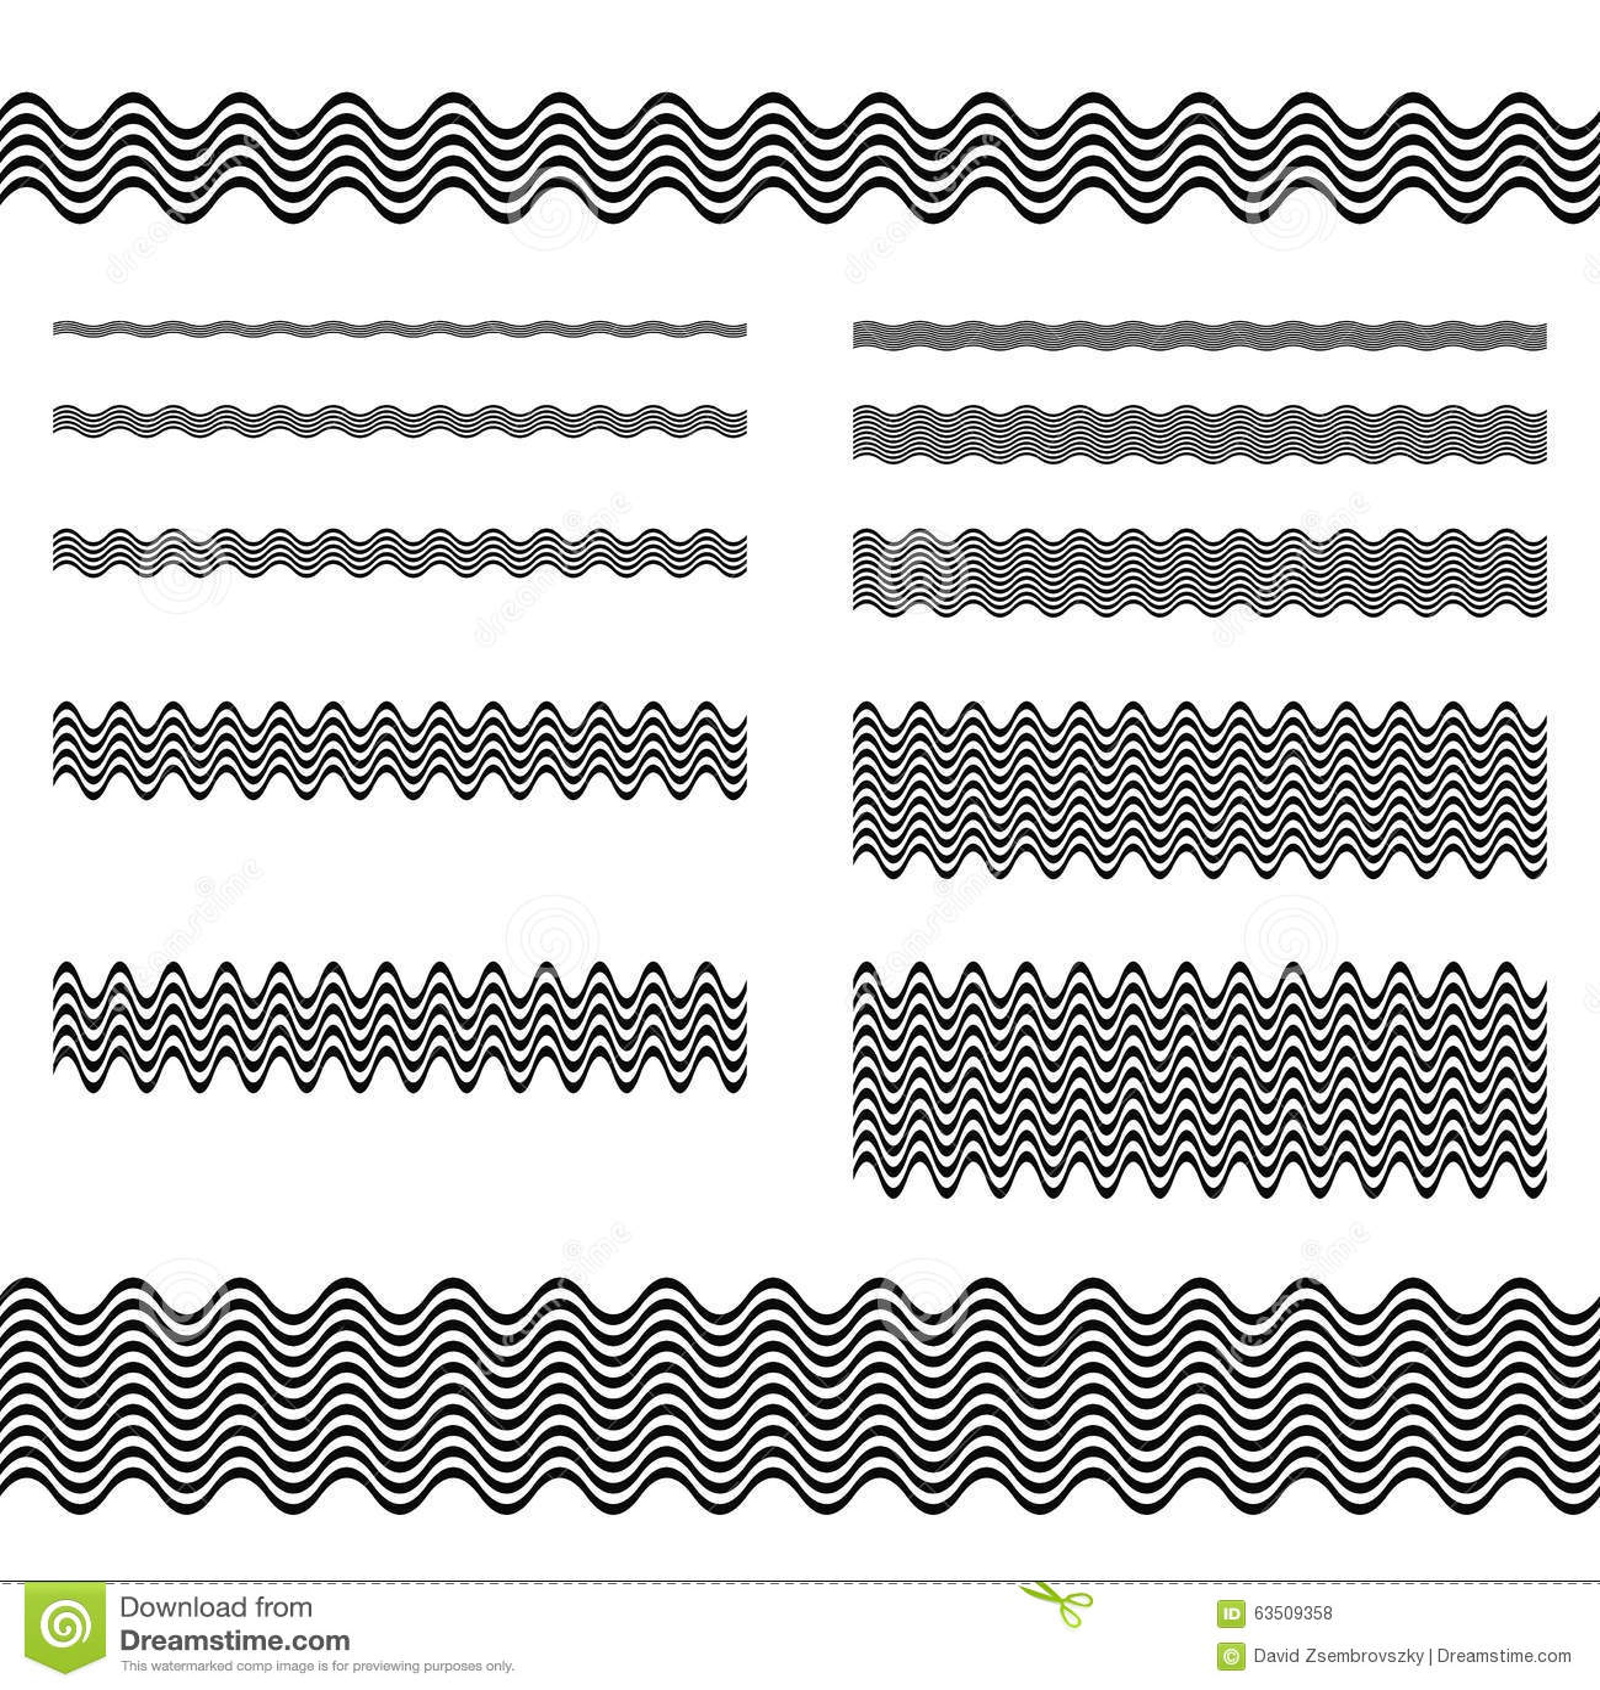 Graphic Design Elements Line : Graphic design elements page divider line set stock